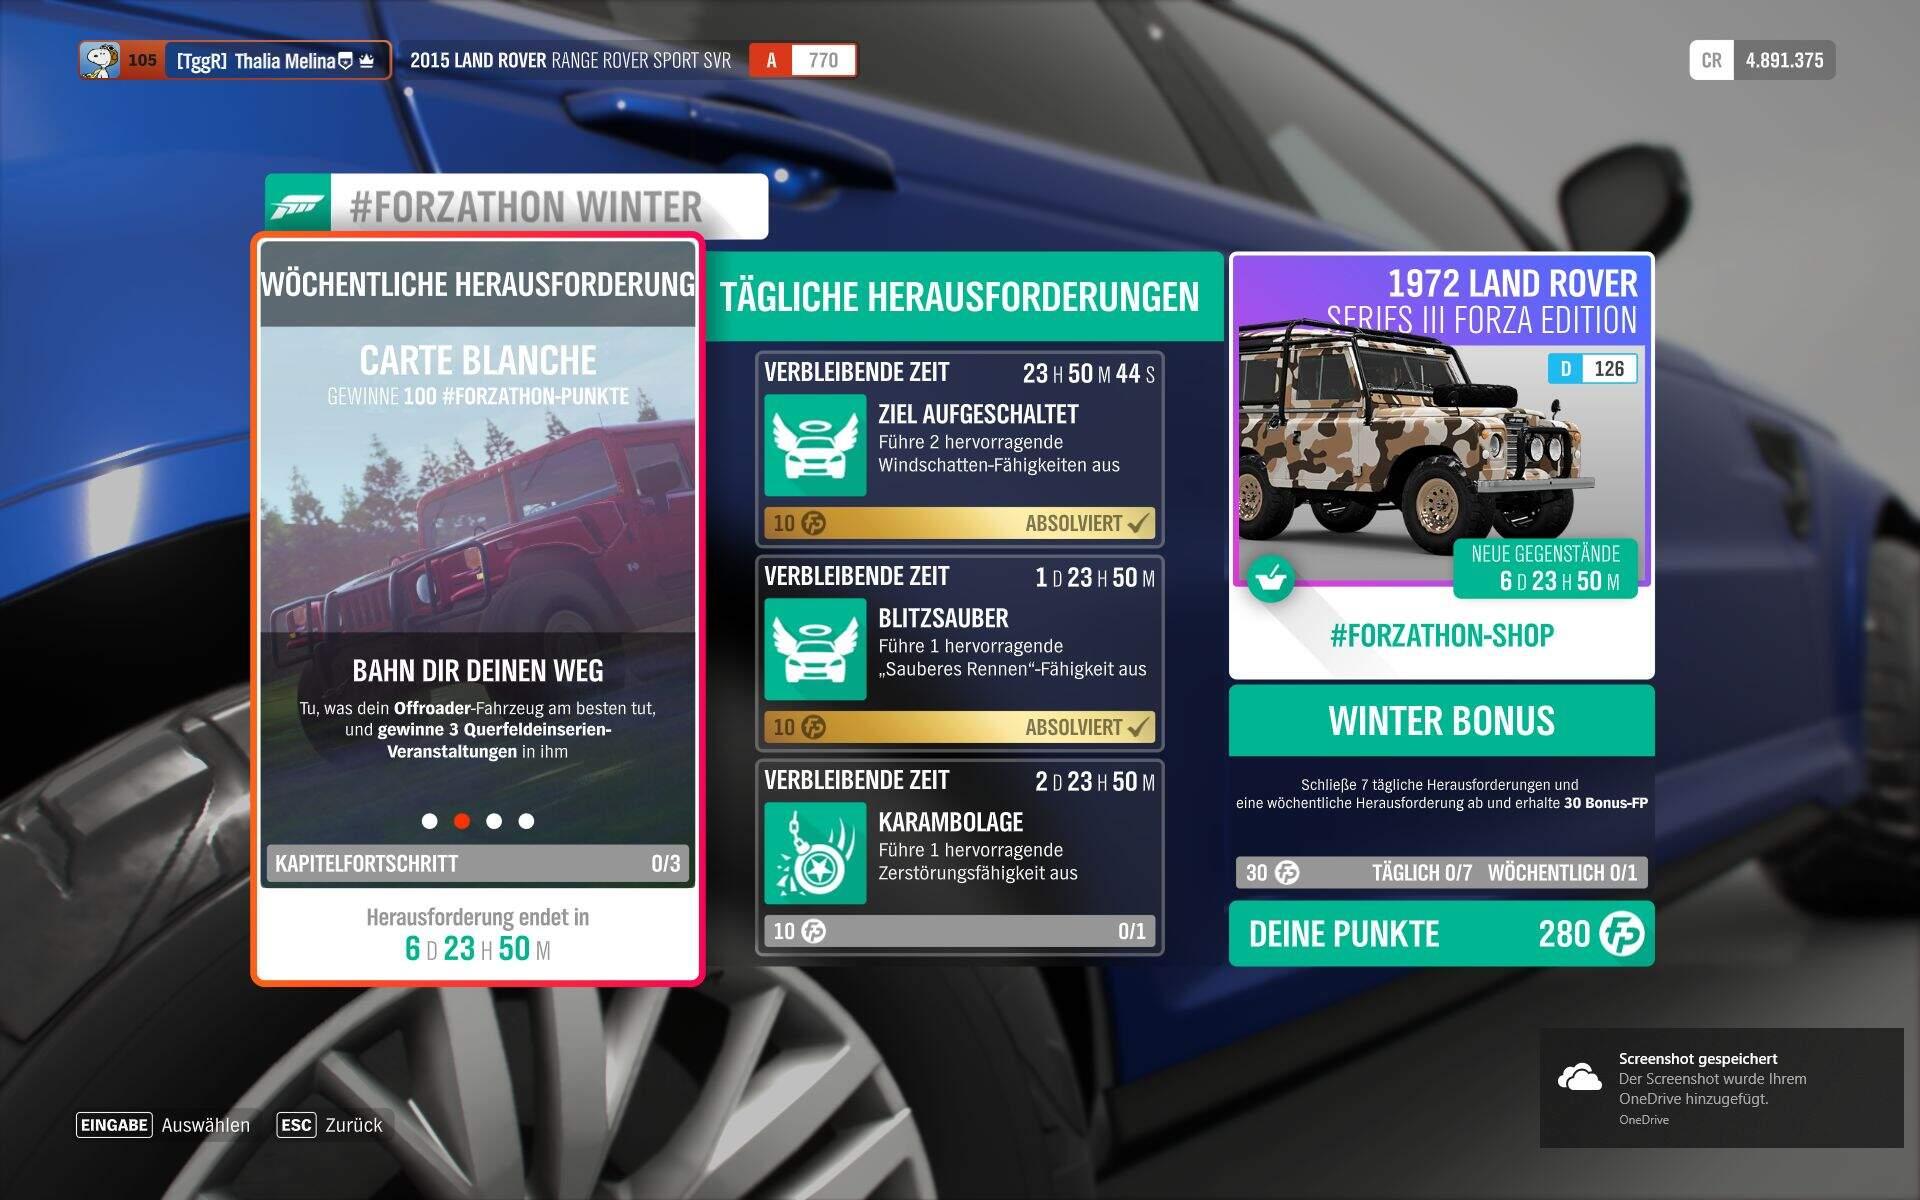 Forza Horizon 4 #Forzathon Guide KW 41 – Carte Blanche Aufgabe 2